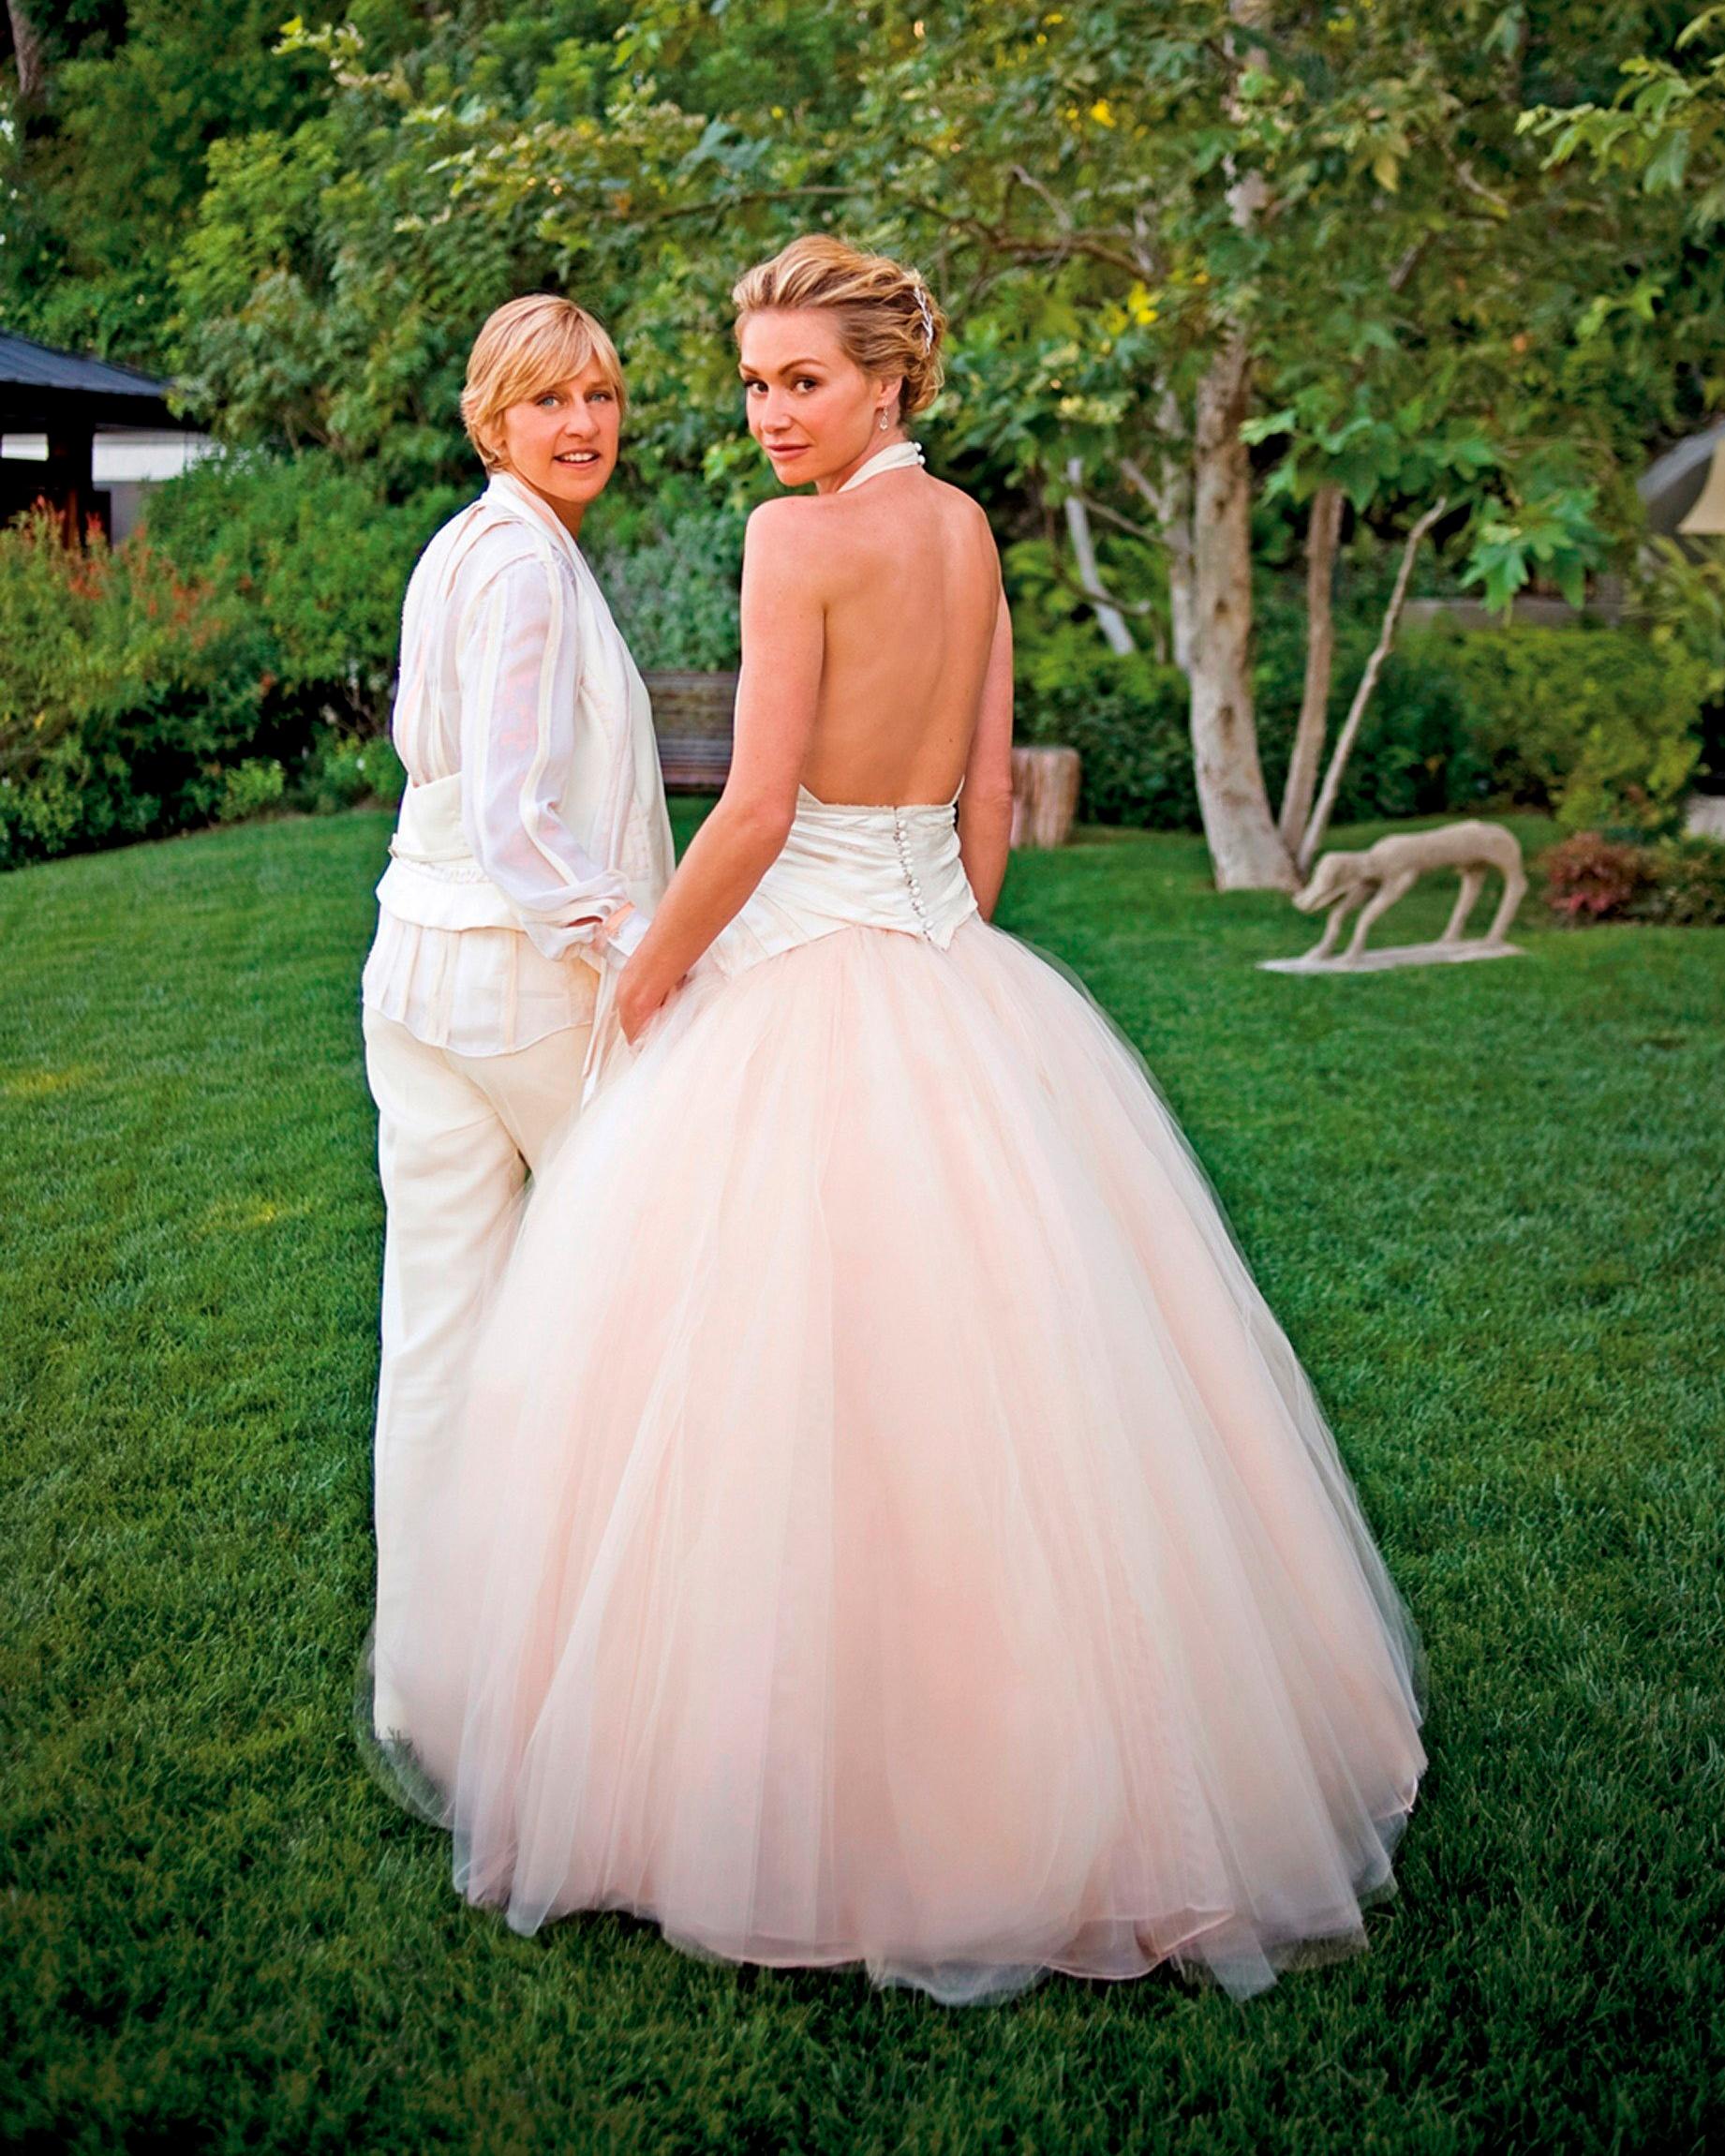 celebrity-pink-wedding-dresses-portia-derossi-gettyimages-82518542-0815.jpg